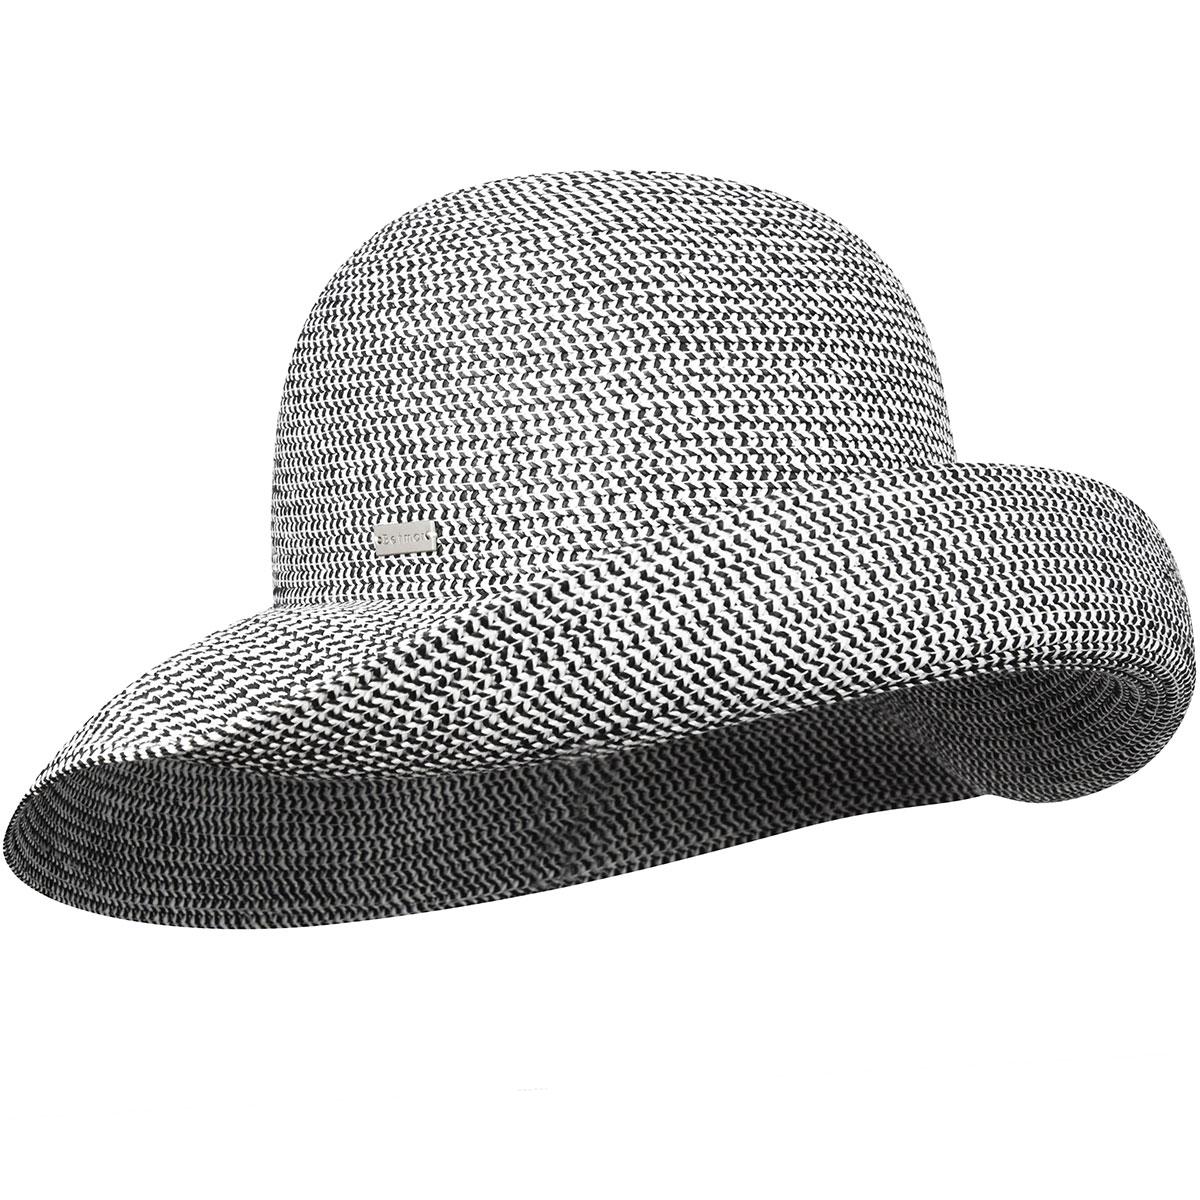 Betmar Classic Roll Up Hat in Black Multi